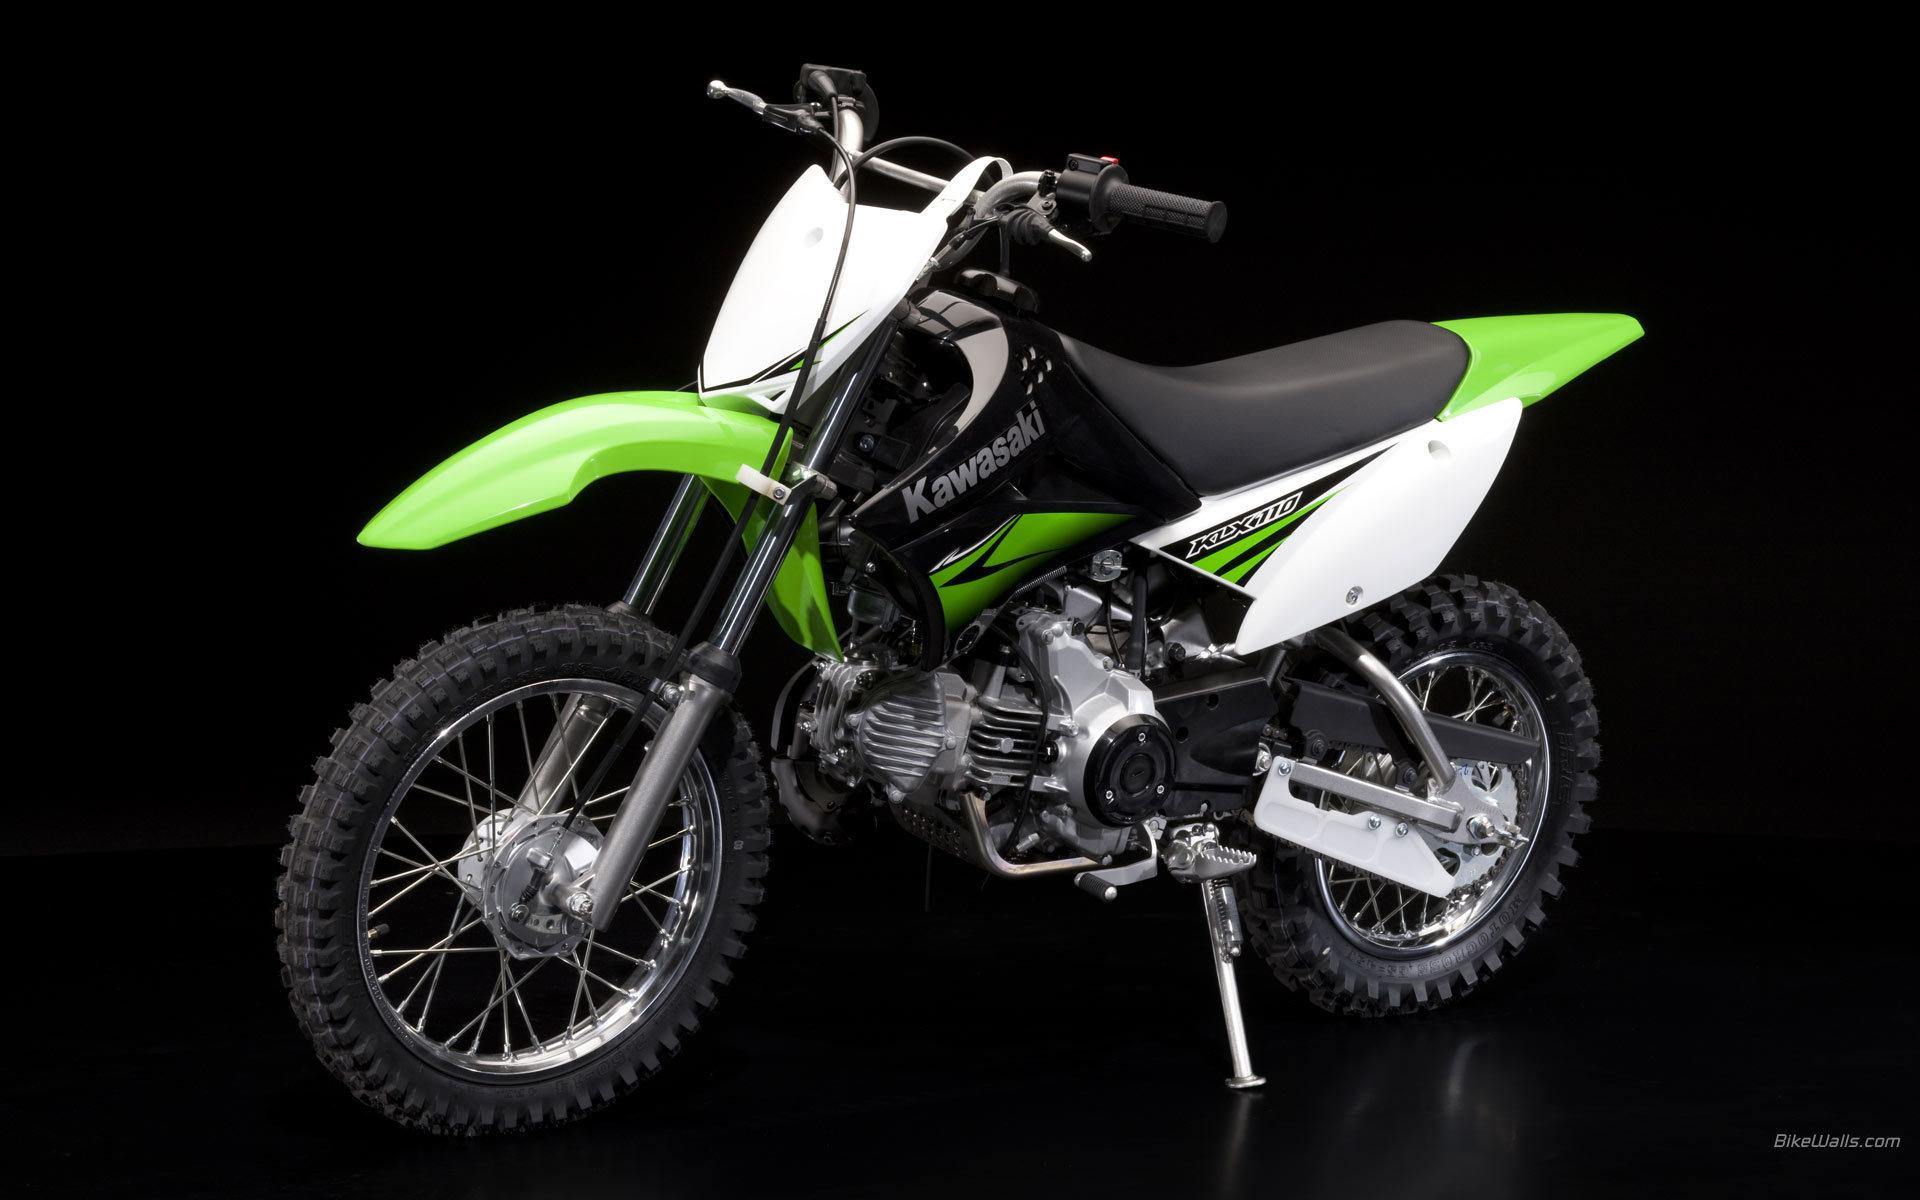 Incredible Motorcycle Kawasaki KLX 110